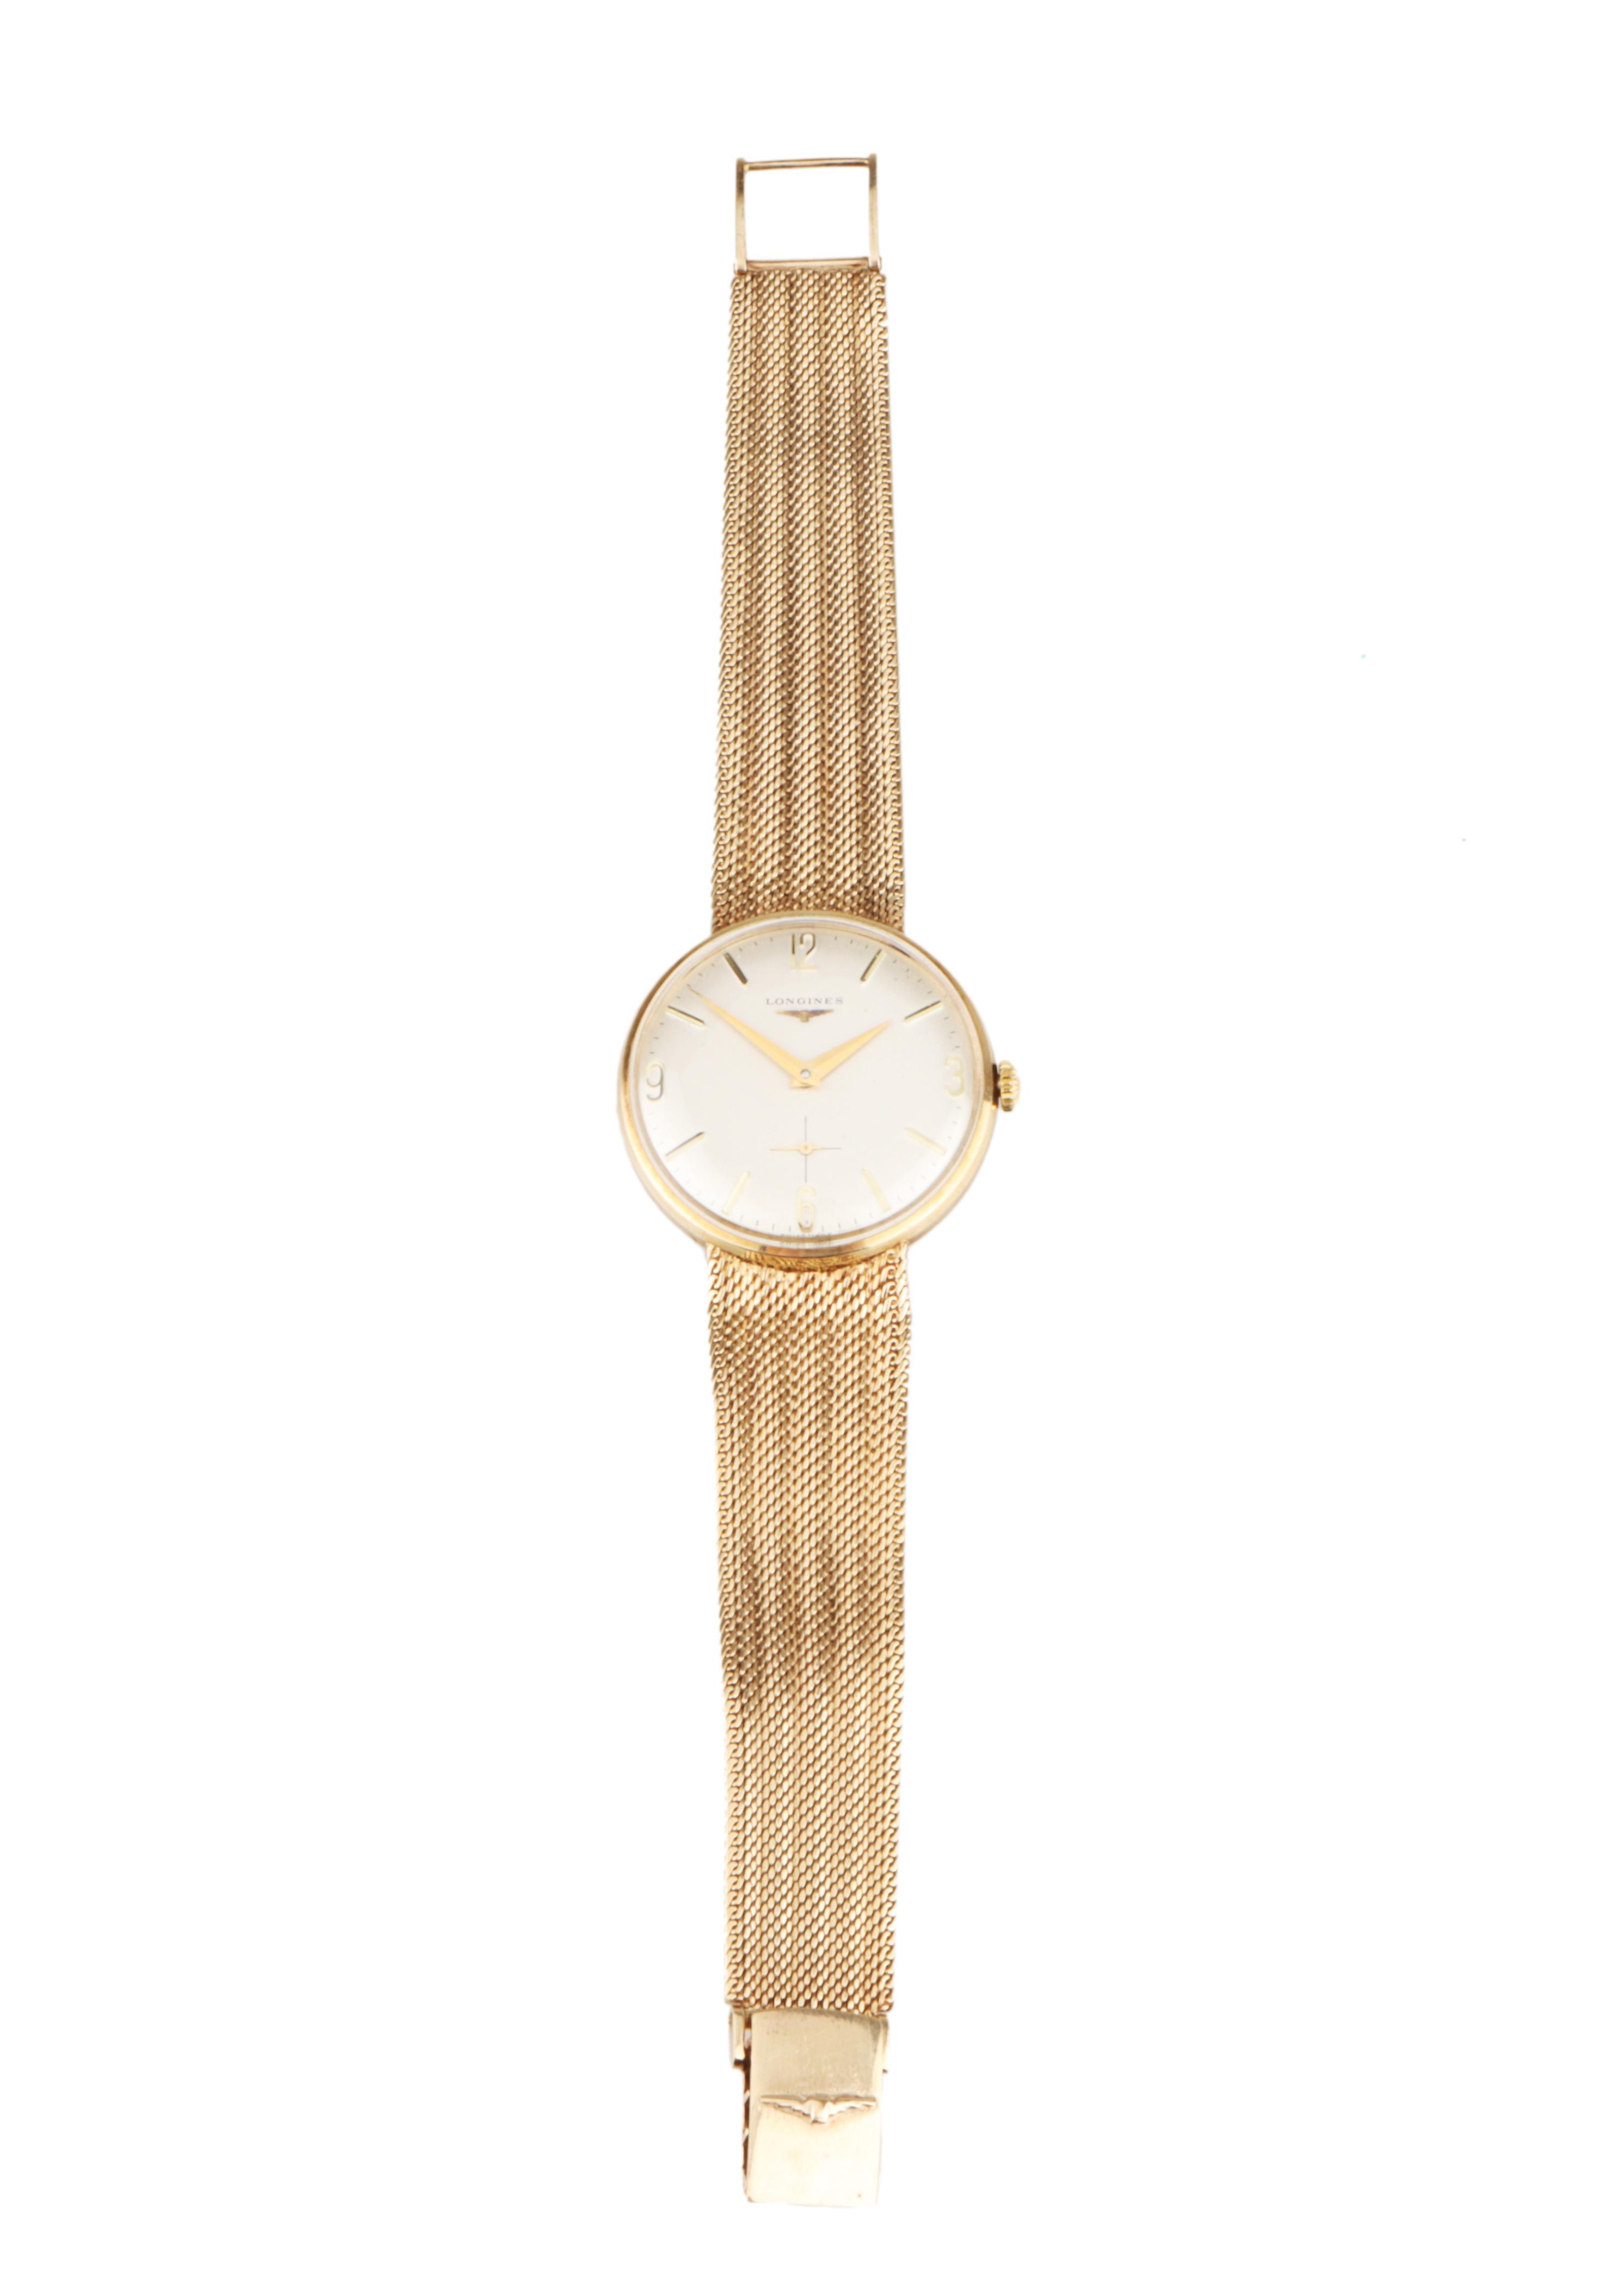 A Fine Gentleman's Longines Gold Wristwatch,